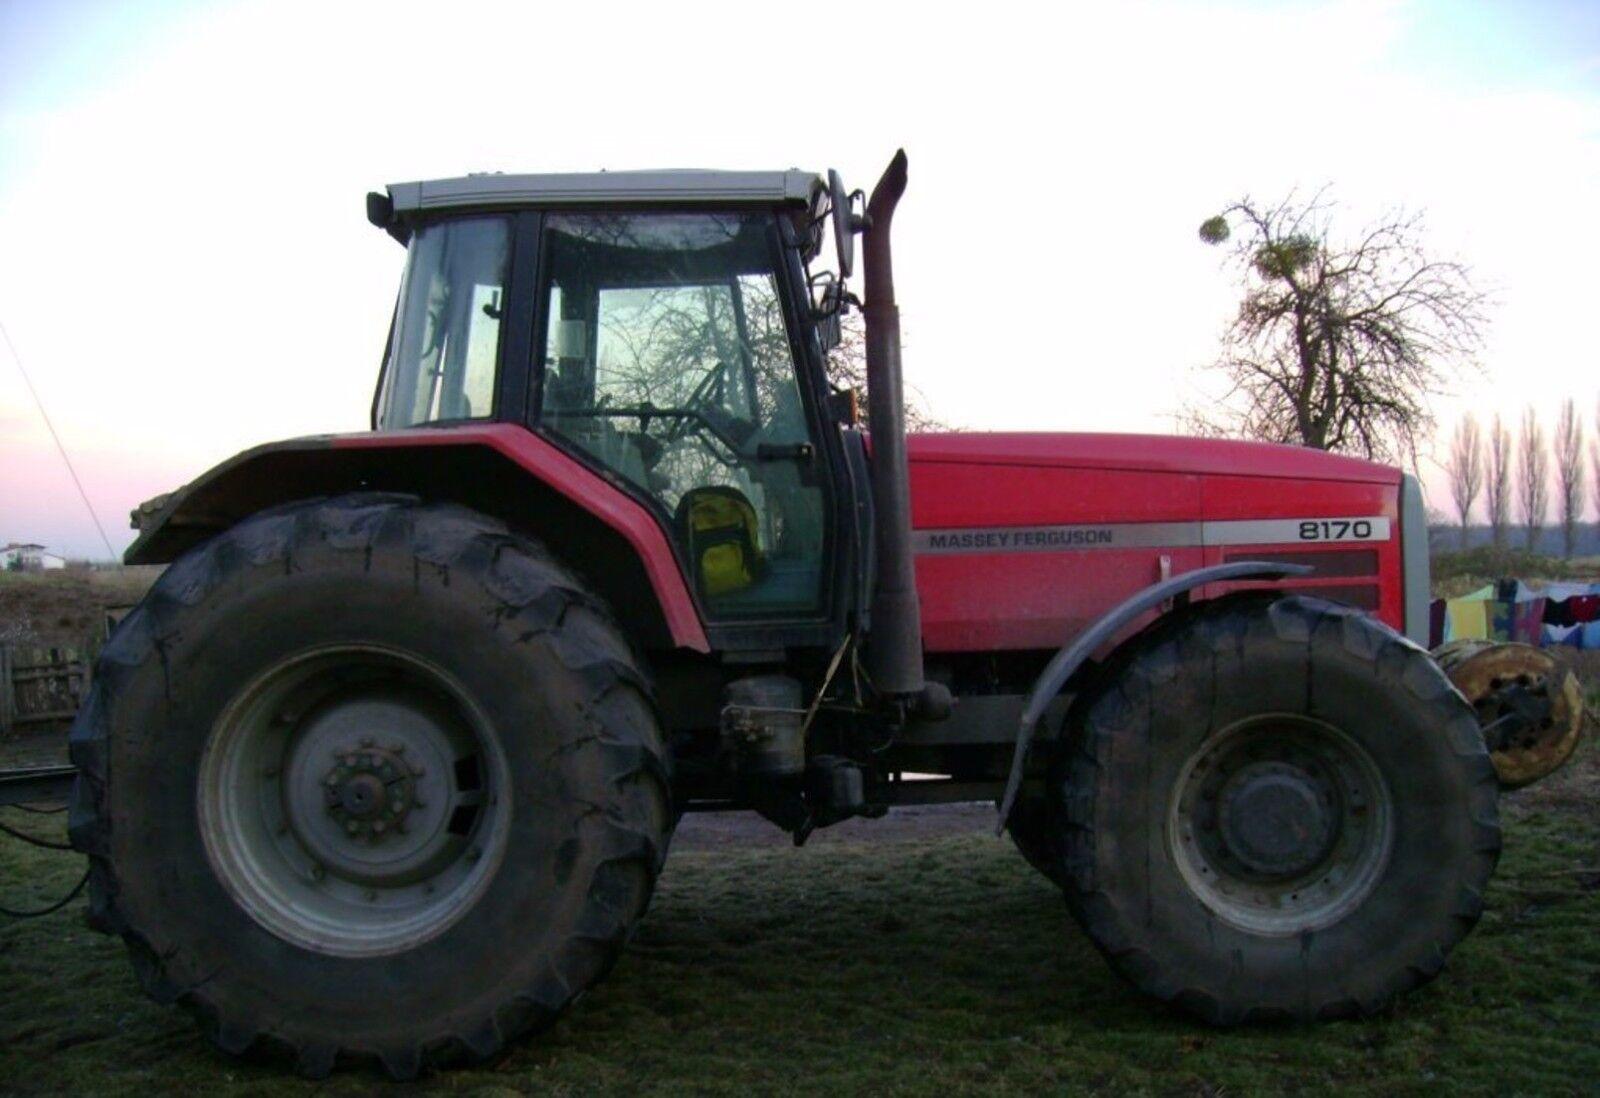 Mf Tractor Decals : Massey ferguson mf tractor parts manual £